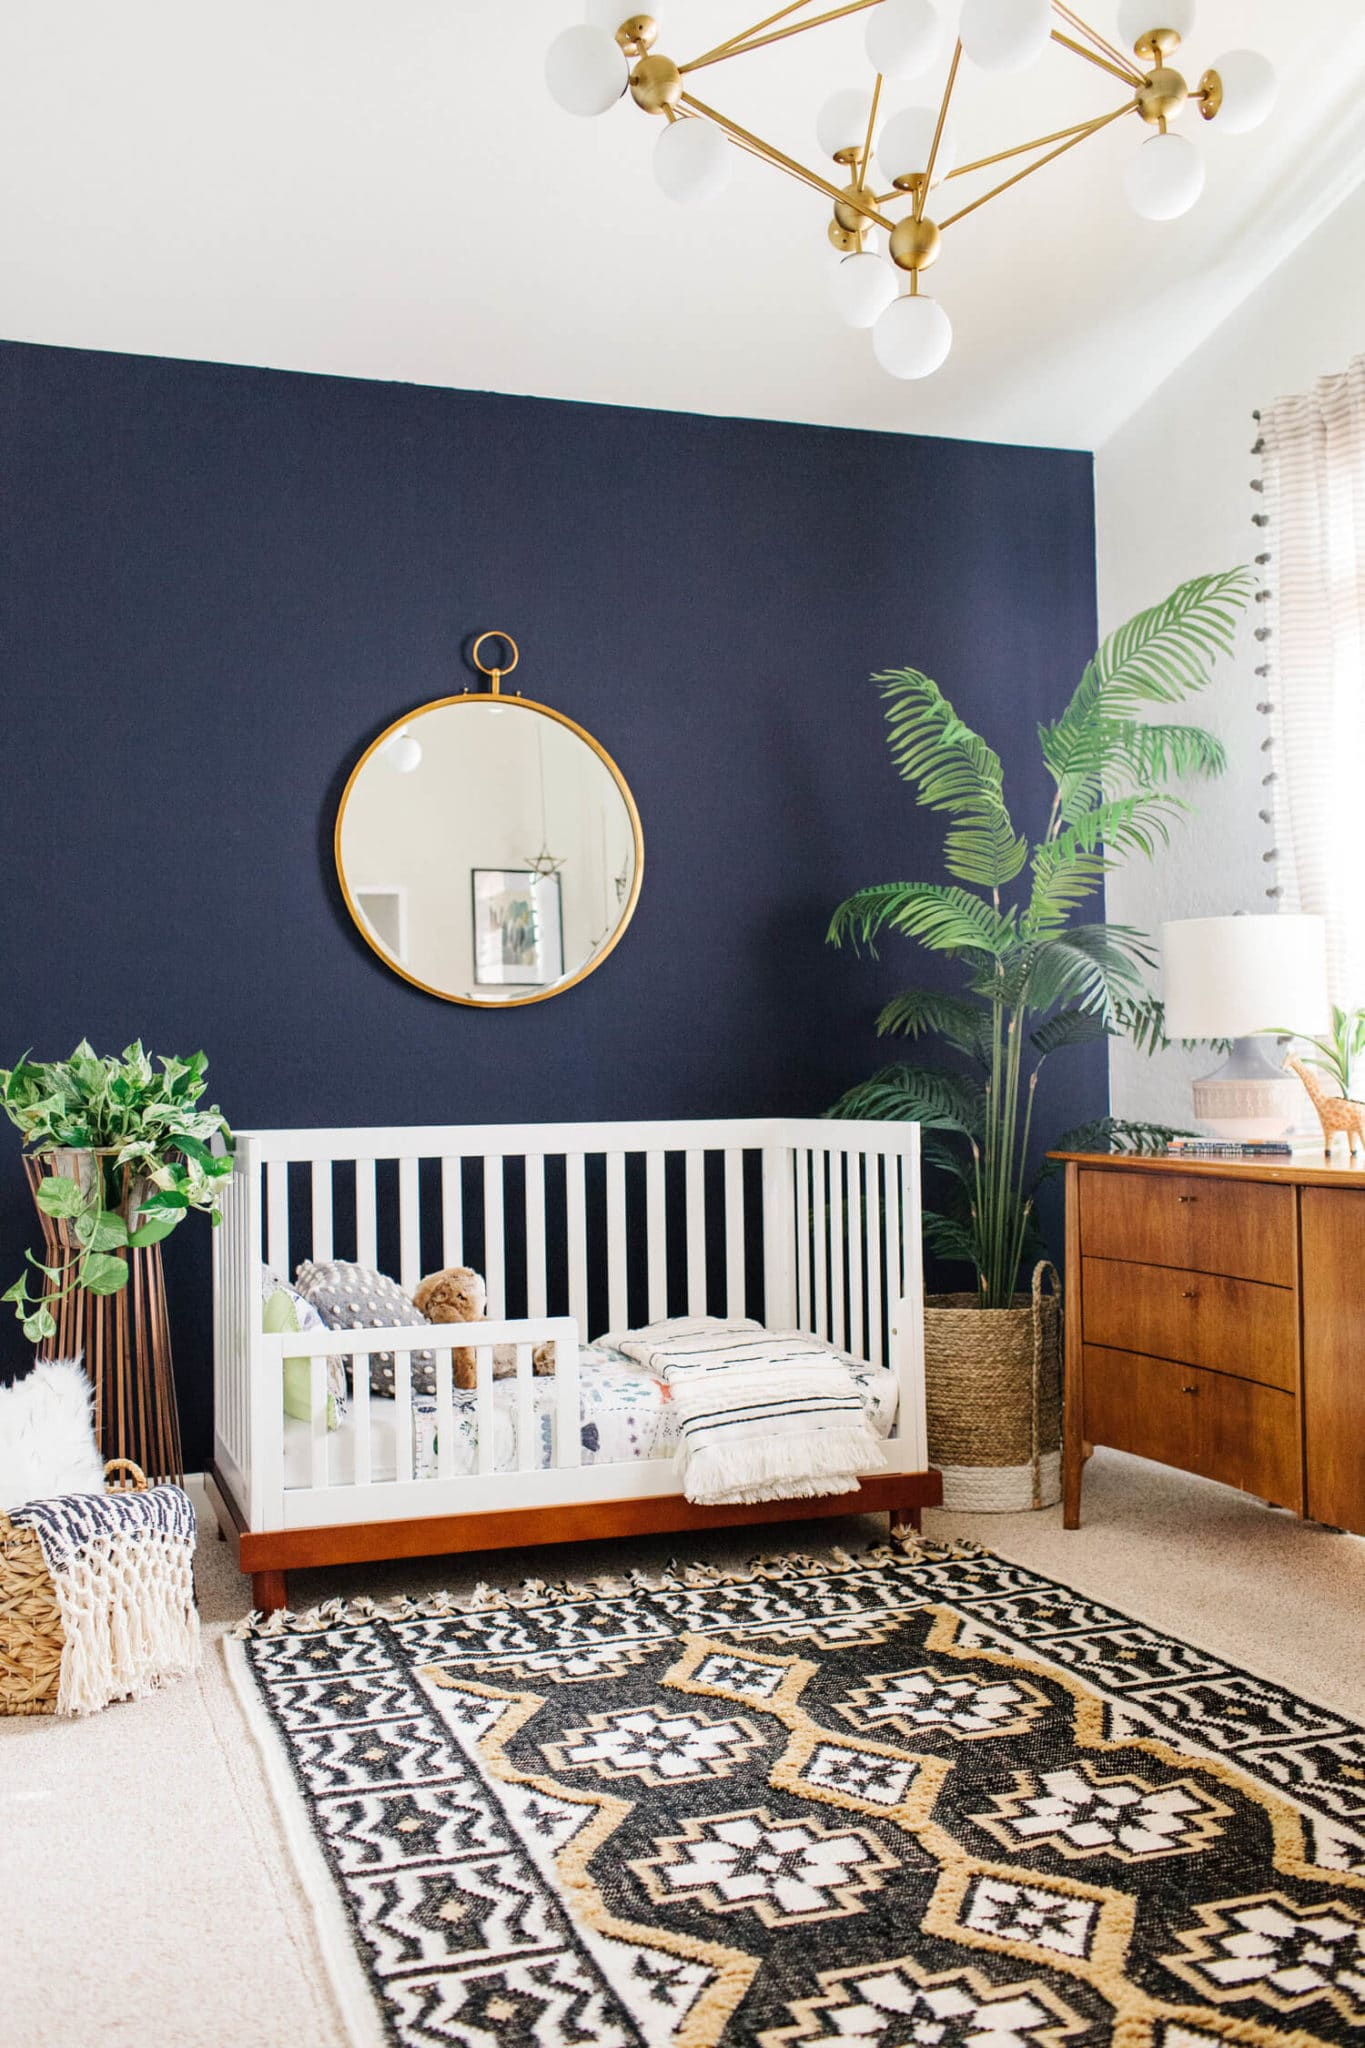 Baby Girl Nursery Ideas  Accent Walls, Animal Themes, & Beautiful